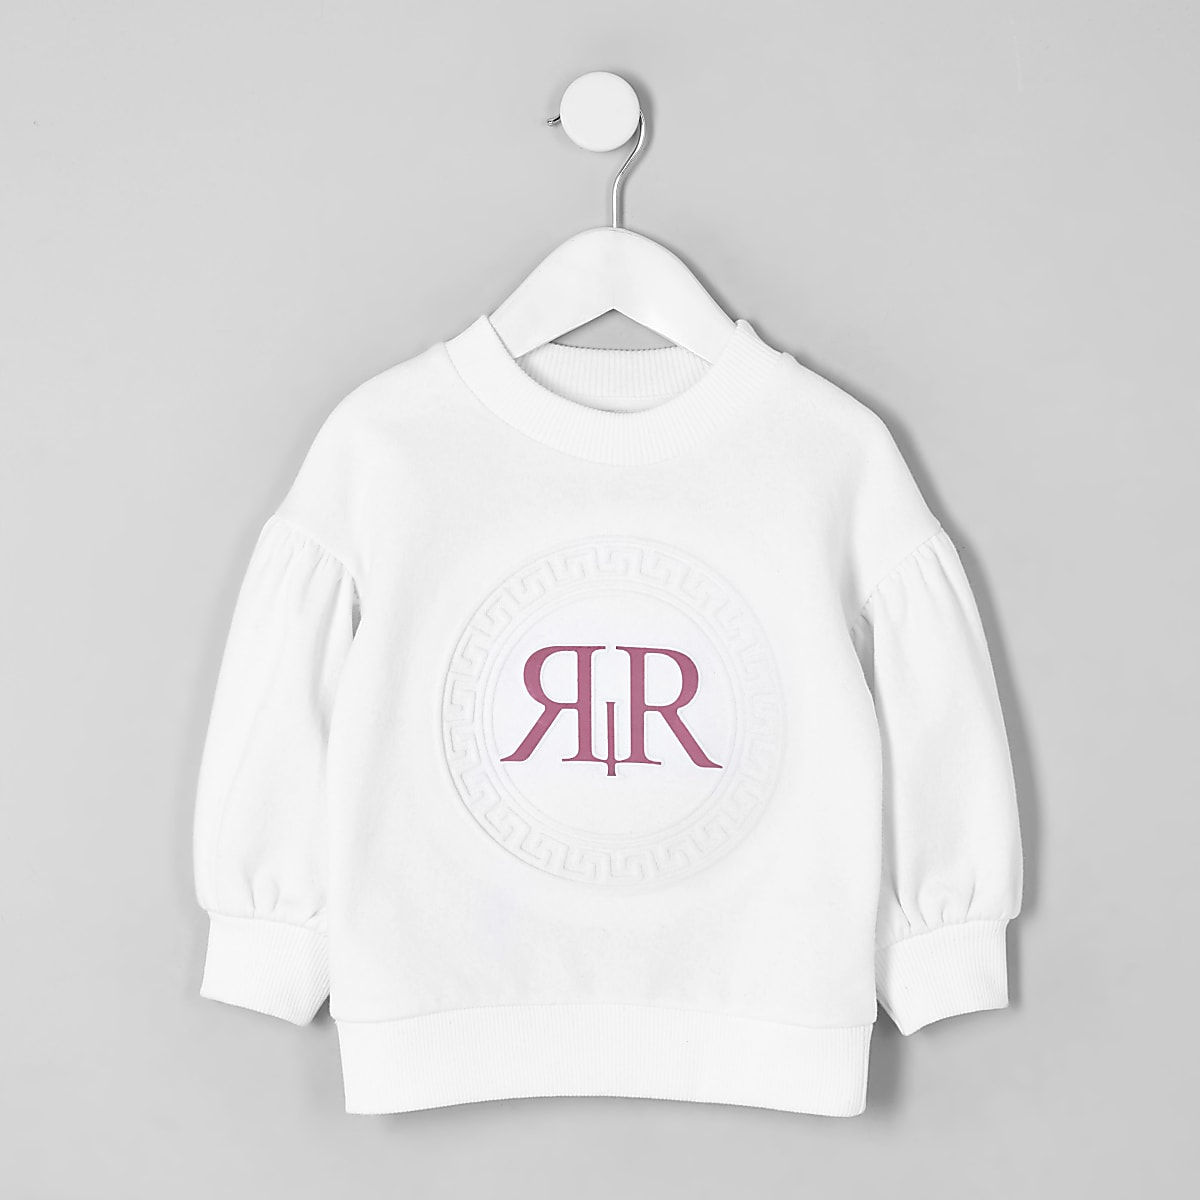 Mini - Wit sweatshirt met RI-logo en lange mouwen voor meisjes